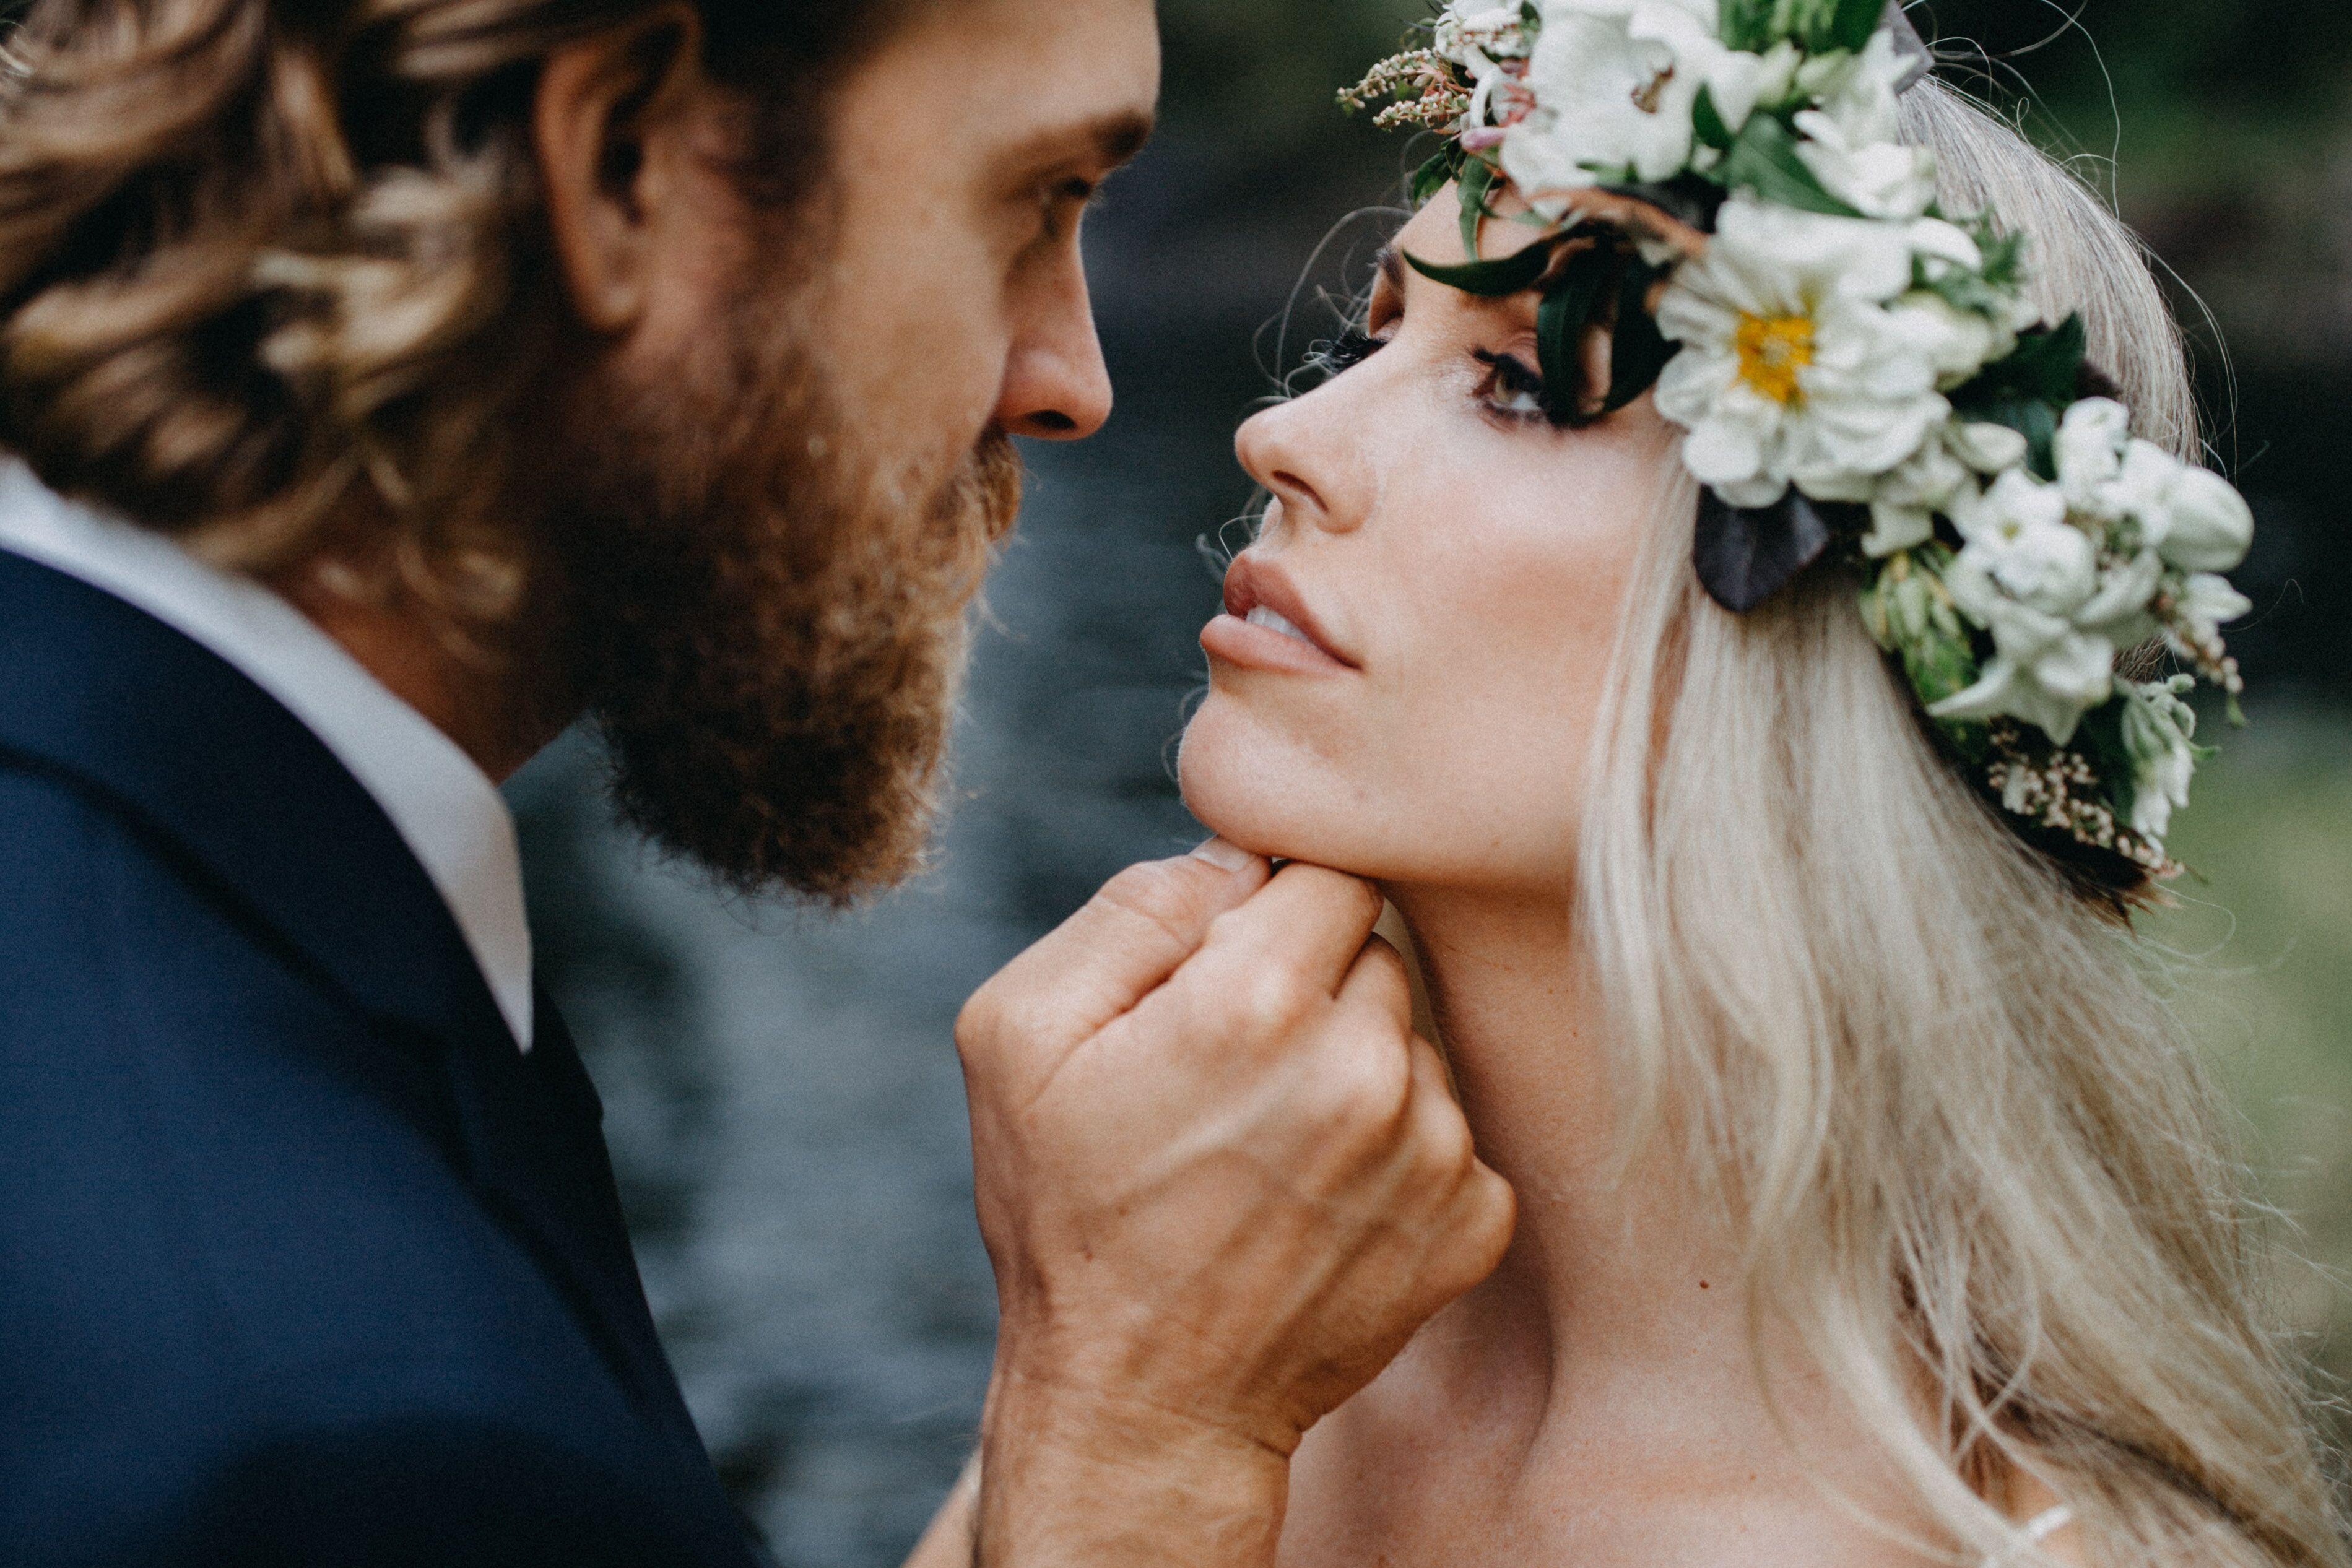 grace makeup artistry | beauty - kailua kona, hi